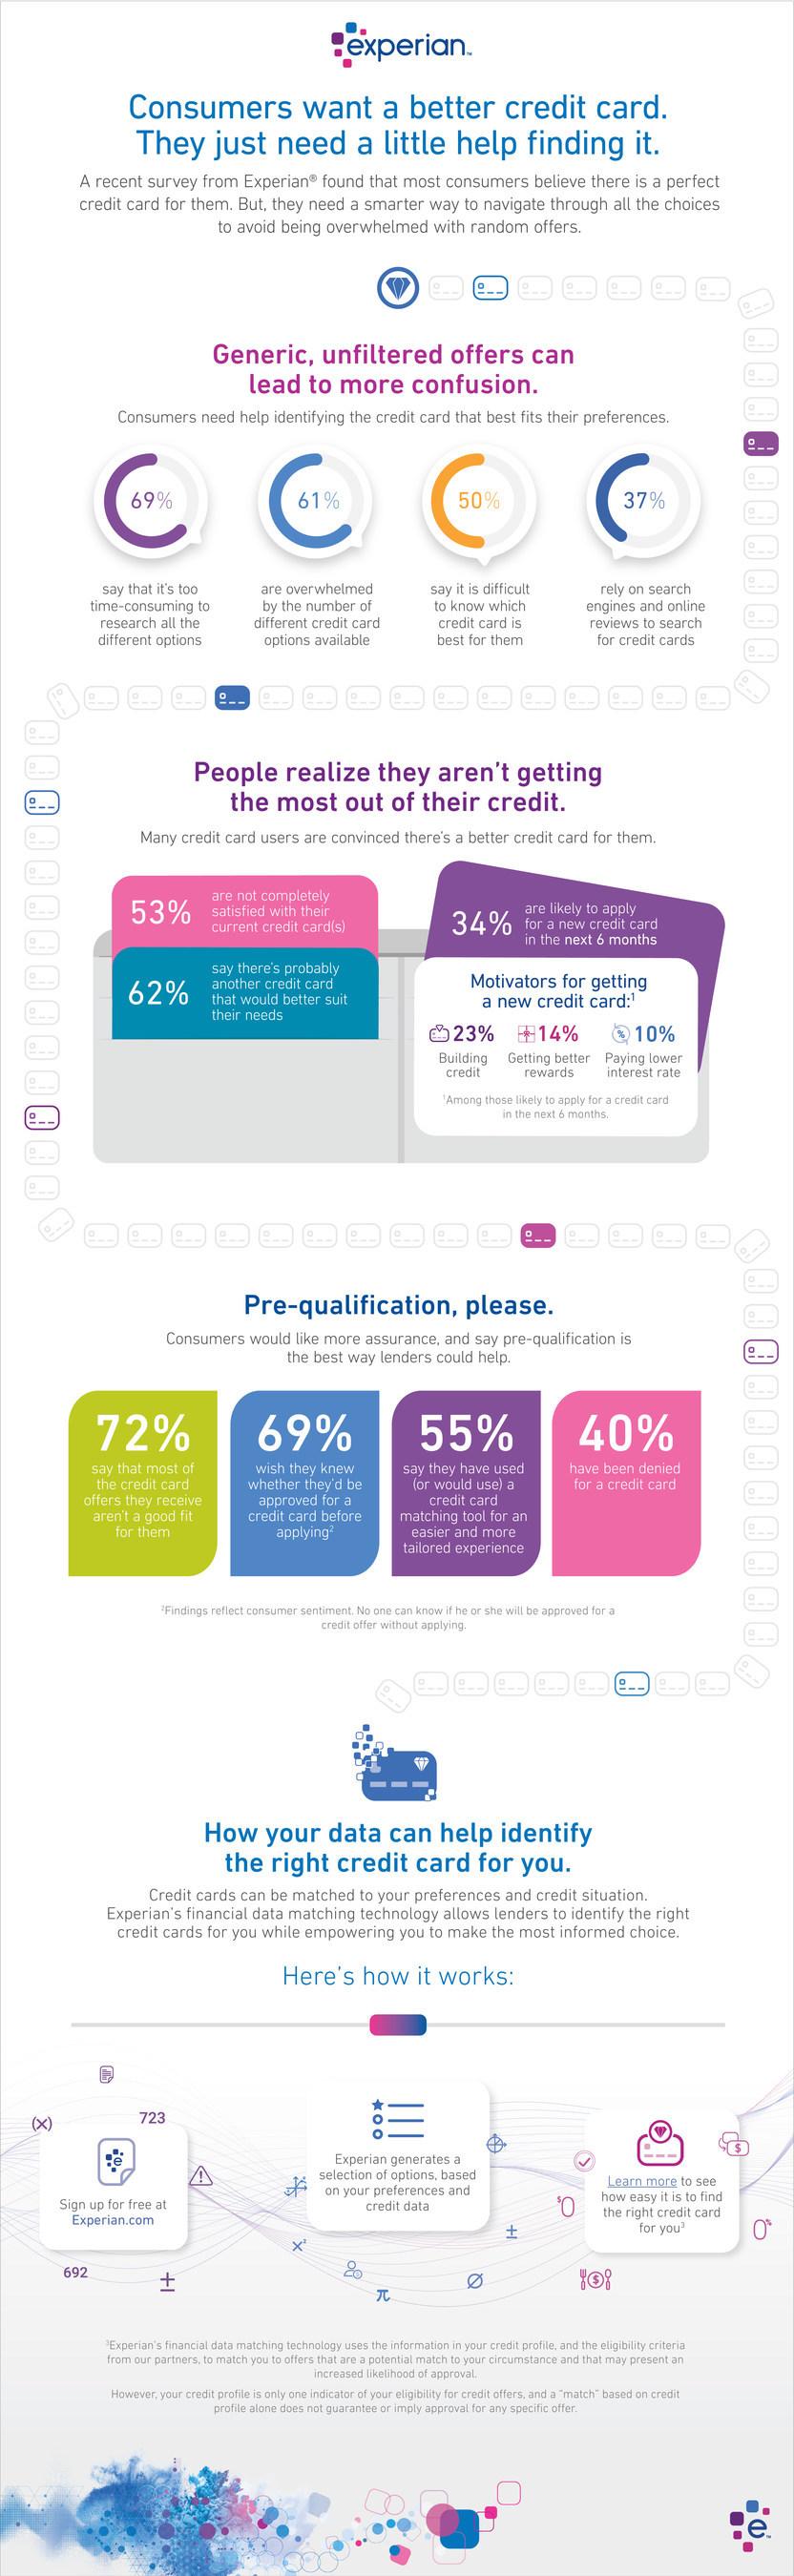 Experian Consumer Credit Card Survey 2017